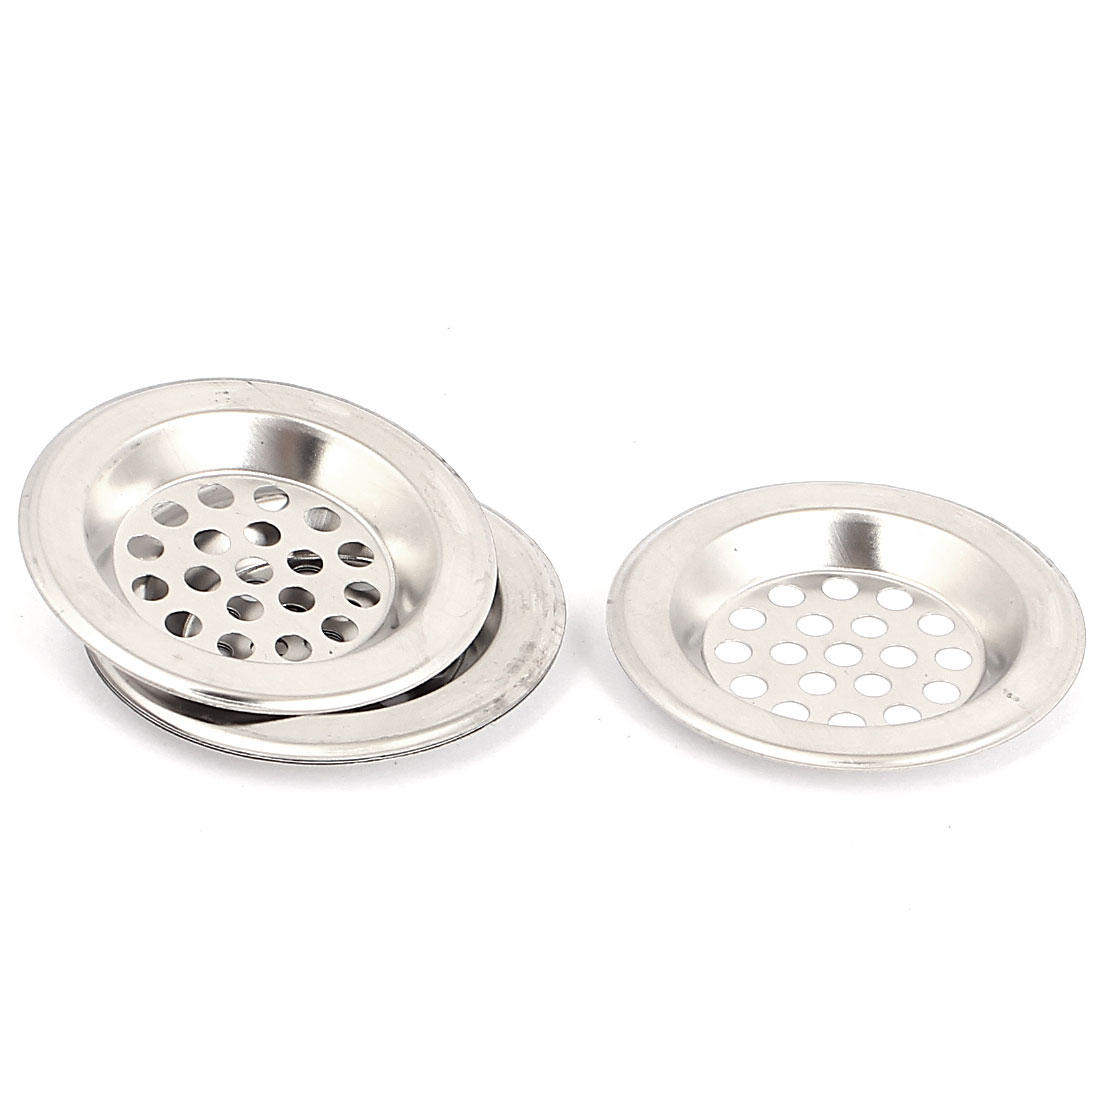 Metal Hole Design Home Bath Shower Floor Sink Drain Strainer Silver Tone 5Pcs